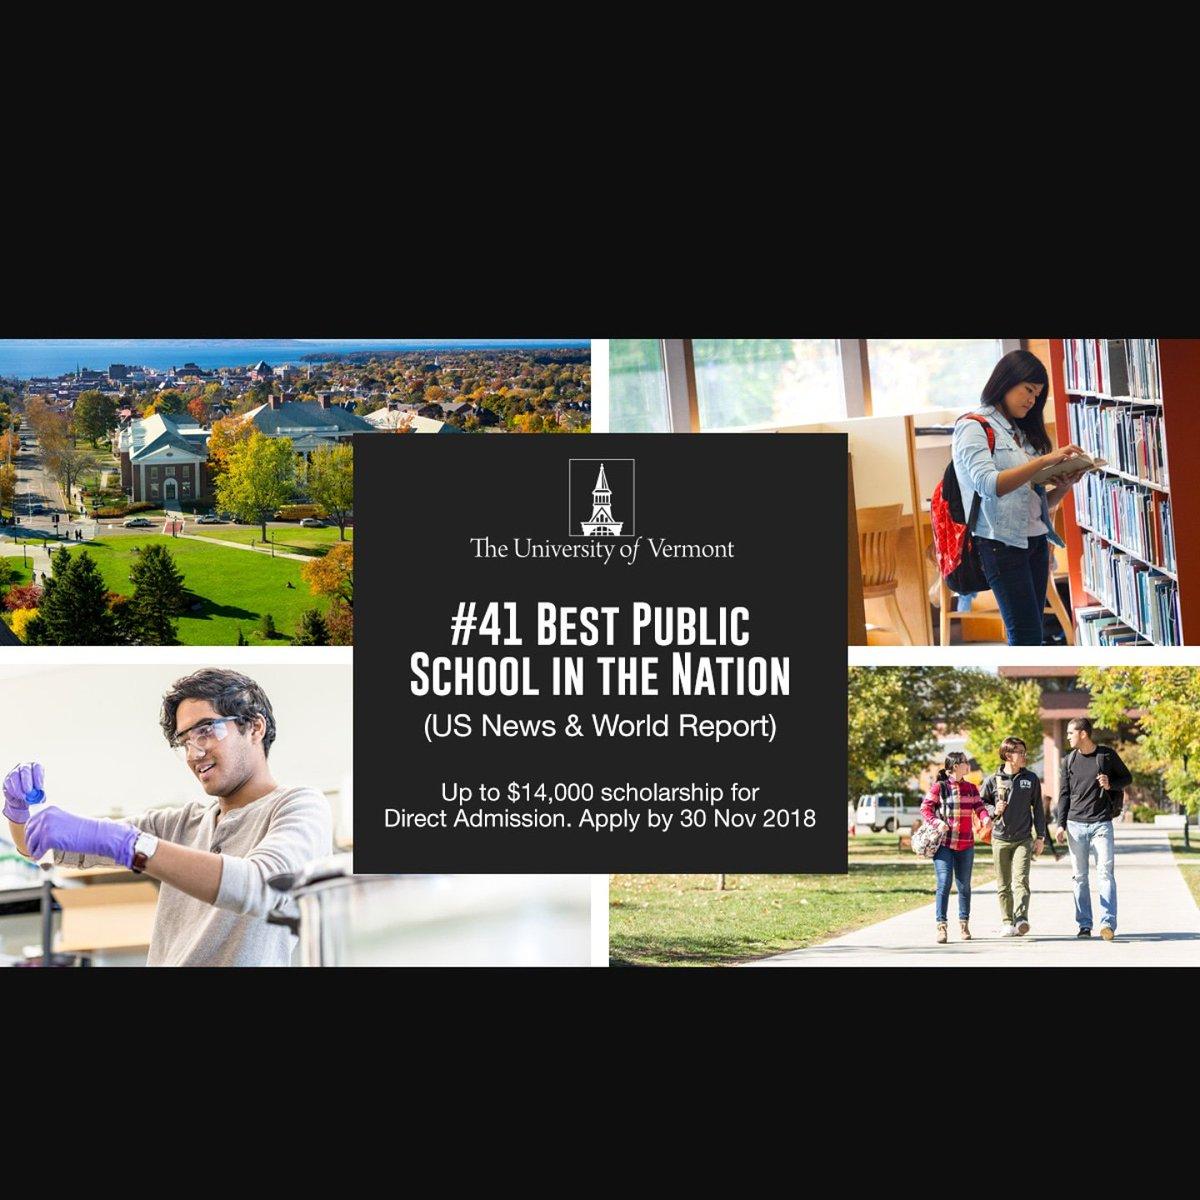 #UniversityOfVermont. Best public university in the nation! Contact us now for more information on #undergraduate and #graduate programs  #studyabroad #studyinUK #Studyvisa #studyinCanada #studyinUSA #ksa #saudi #arabia #iran #bahrain #qatar #morocco #egypt #kuwait #tunis #oman